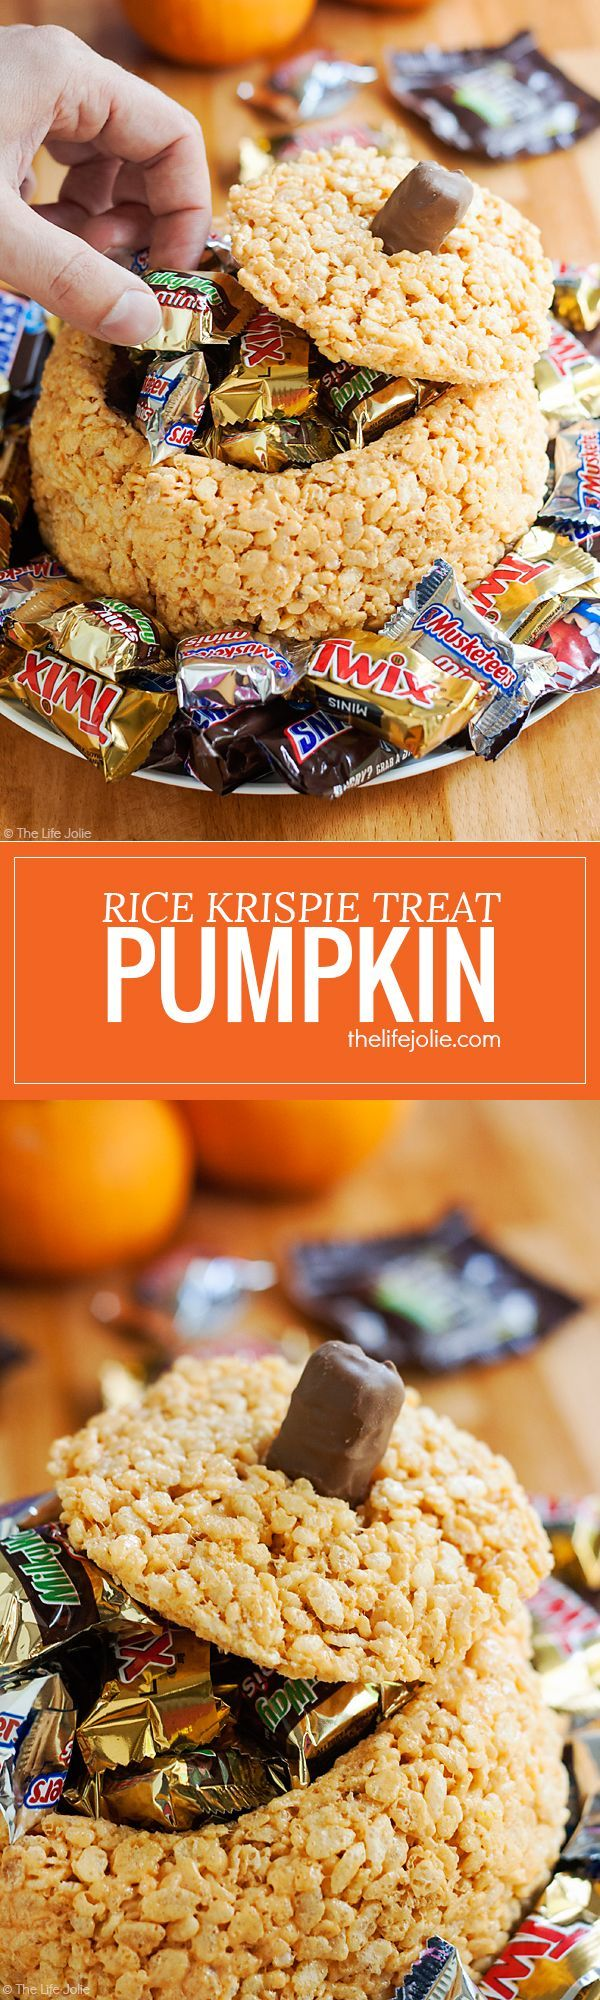 1779 best images about Halloween on Pinterest | Frankenstein, Easy ...